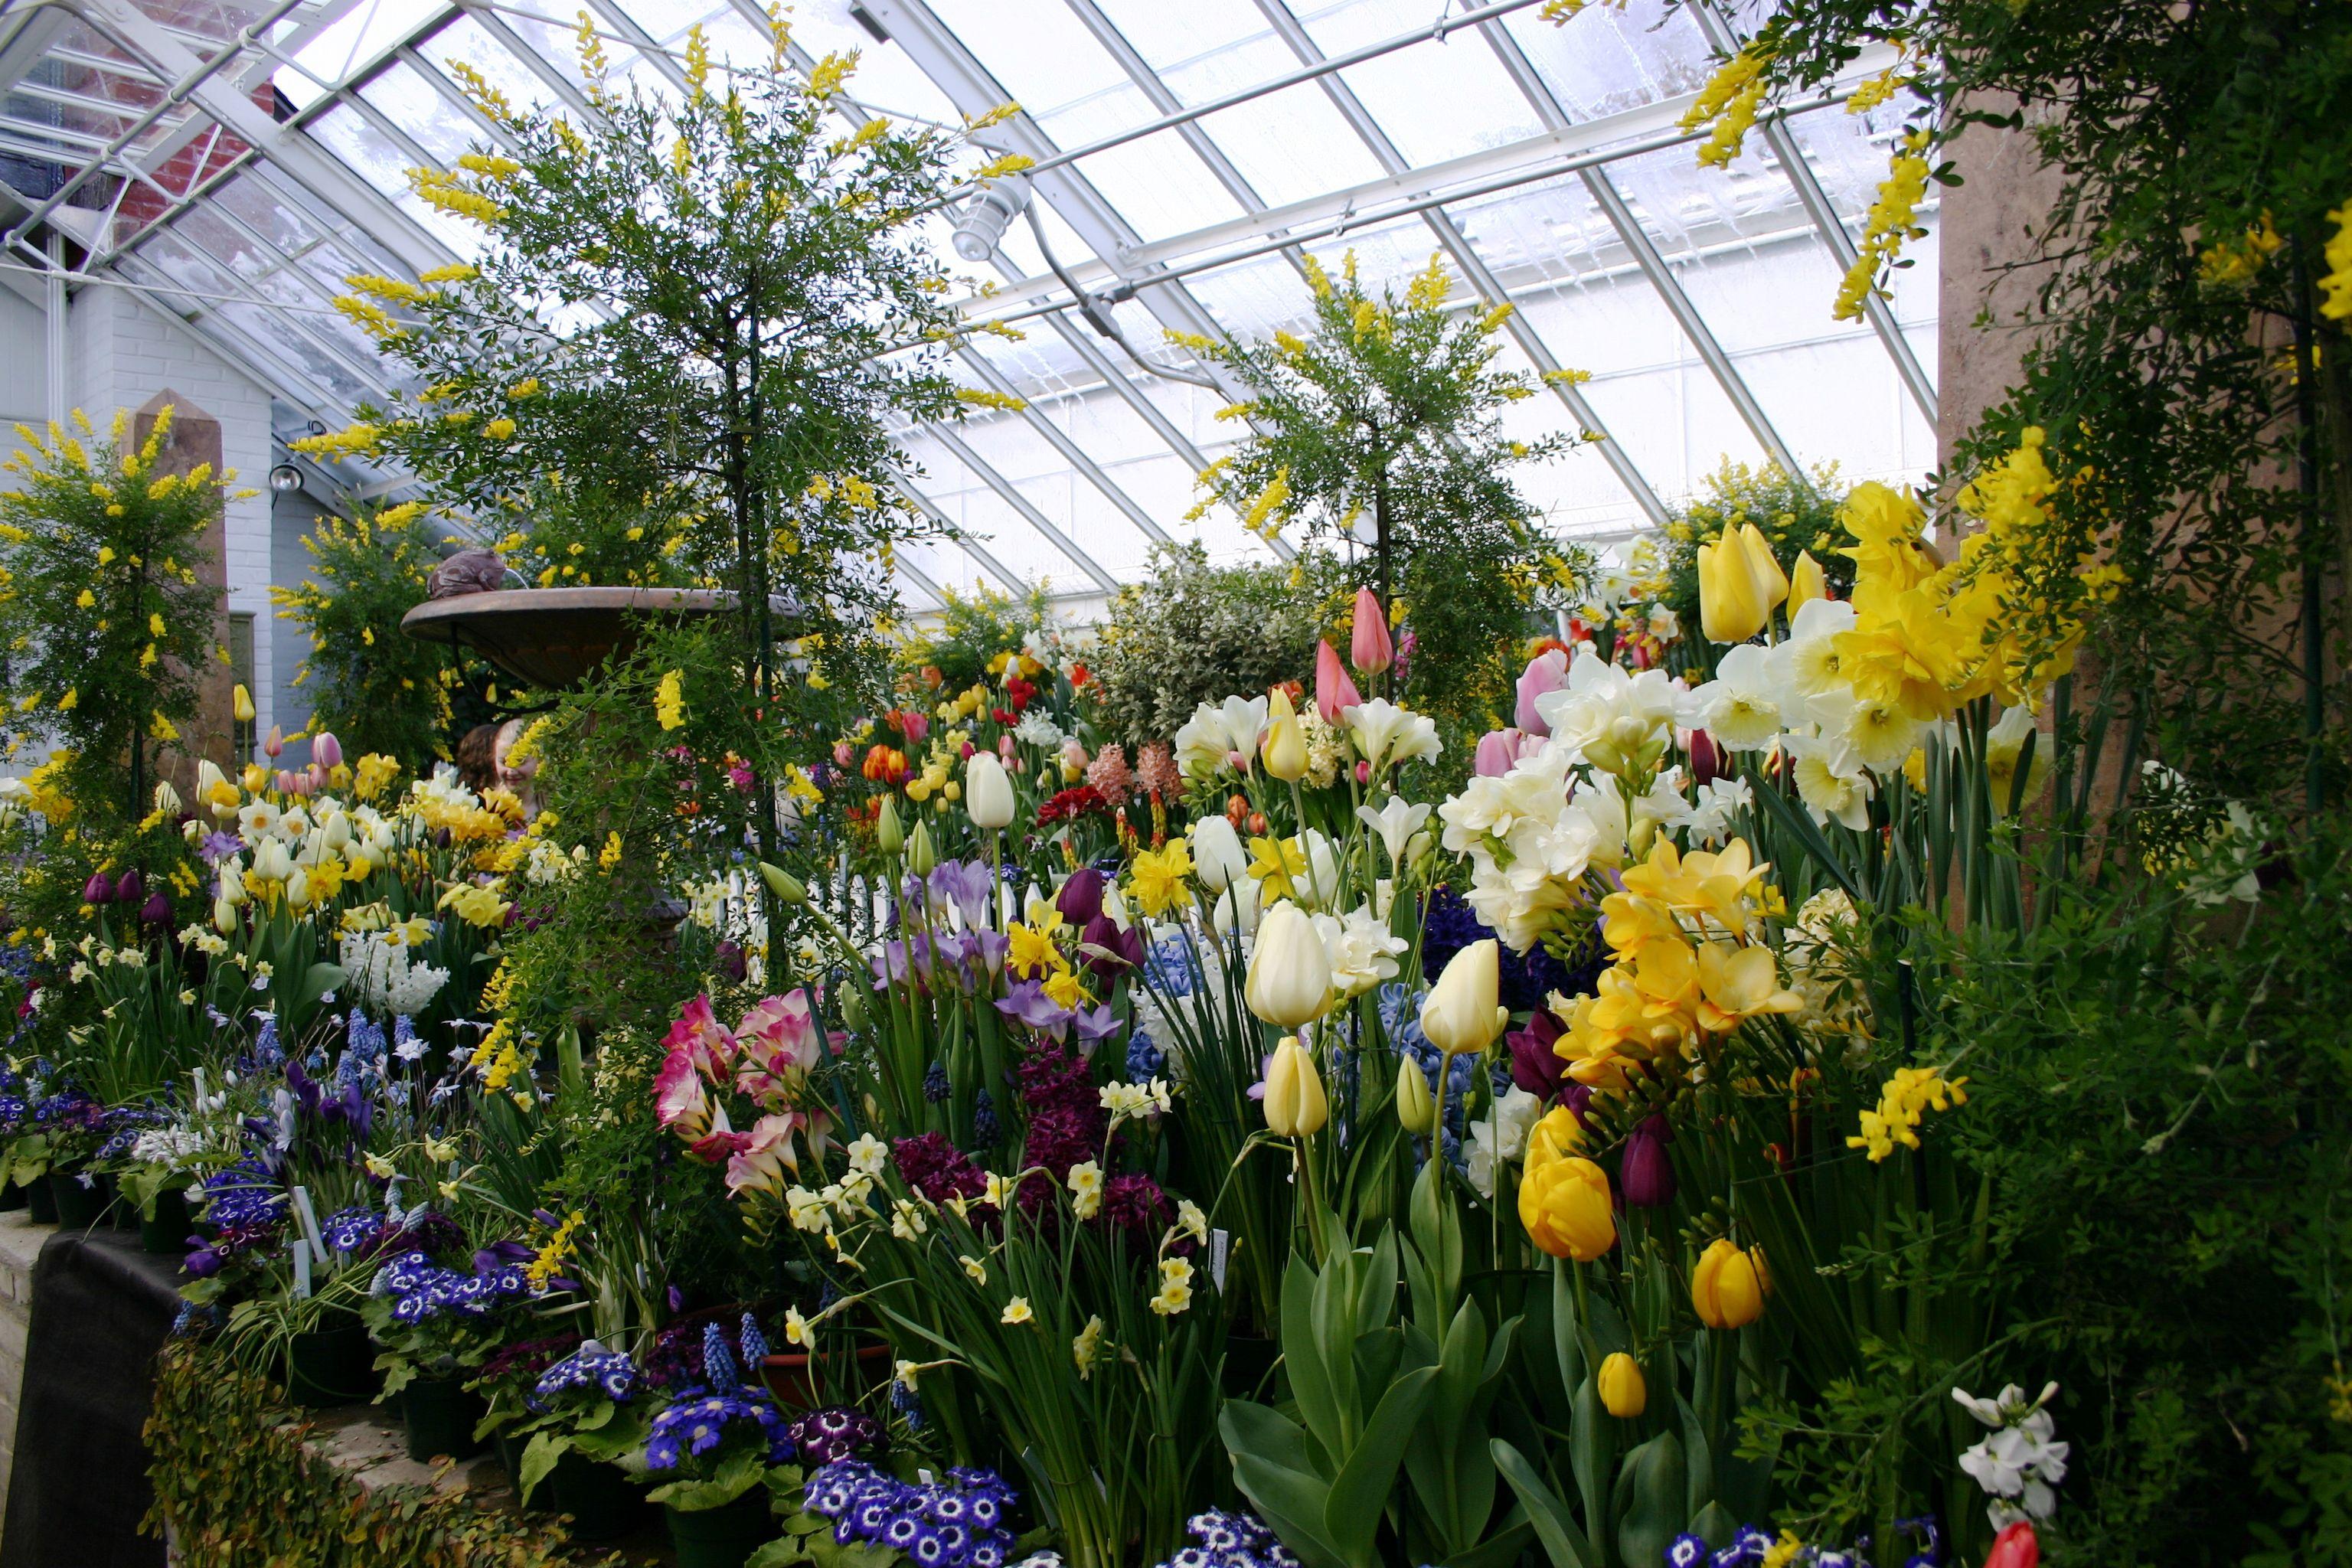 Smith College's greenhouse